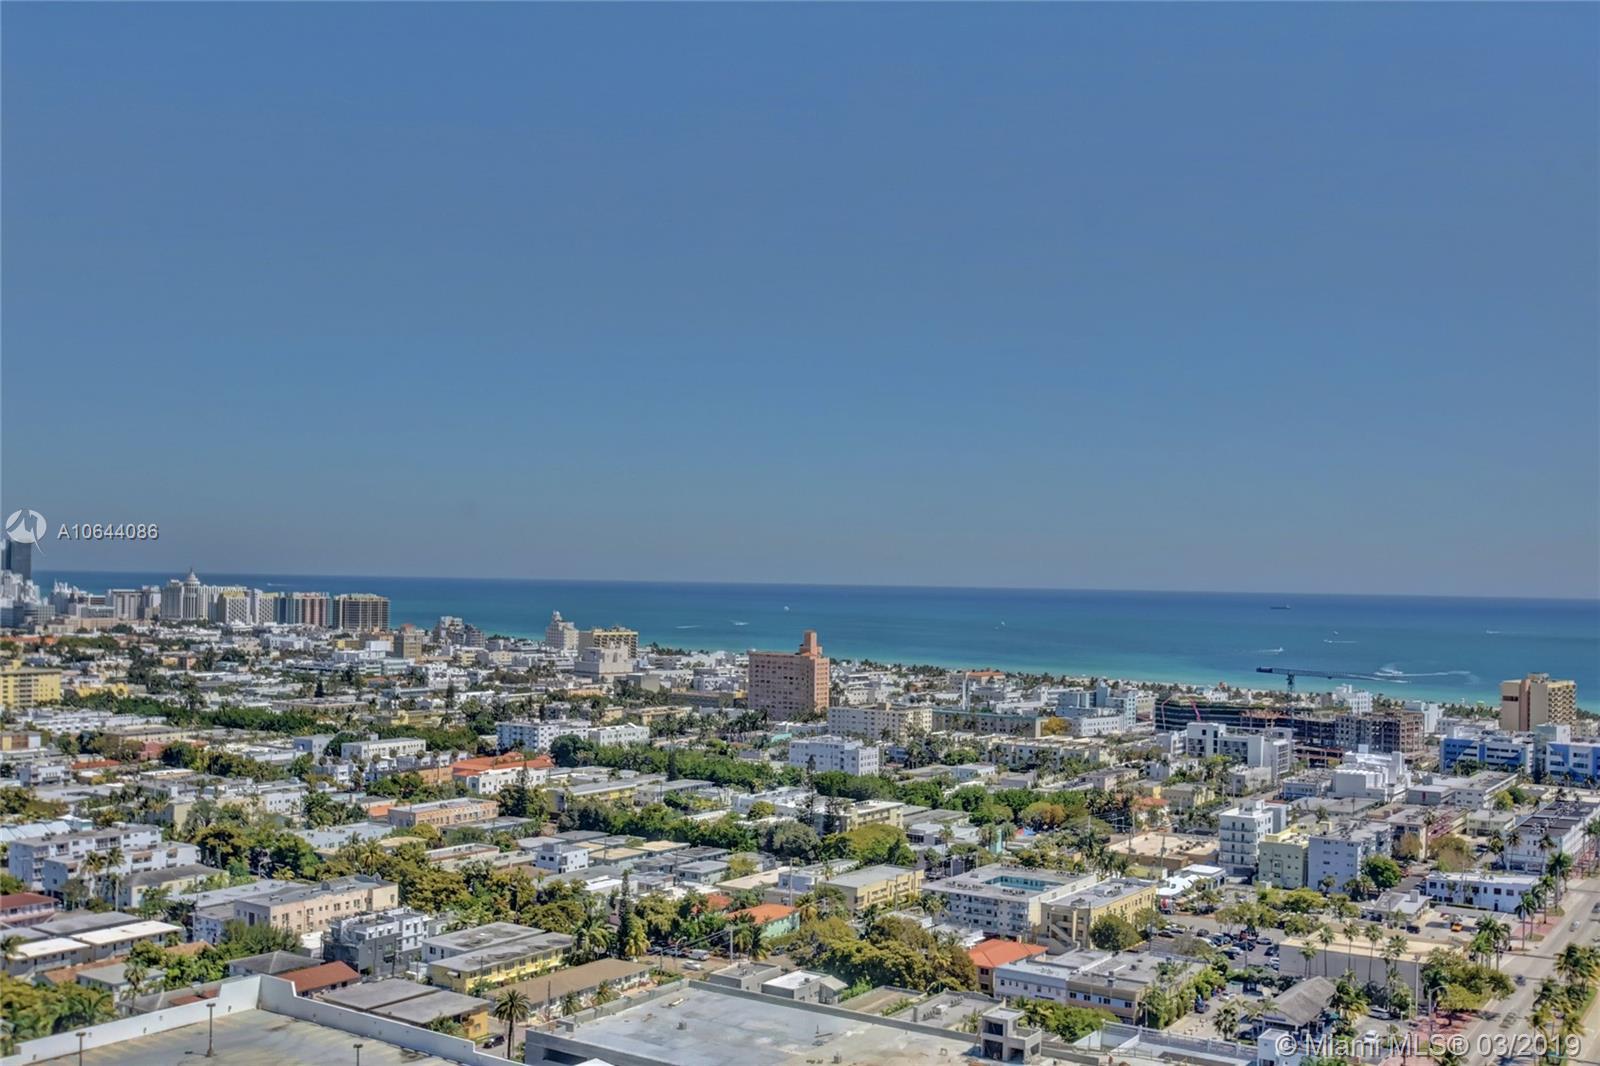 ICON South Beach image #32